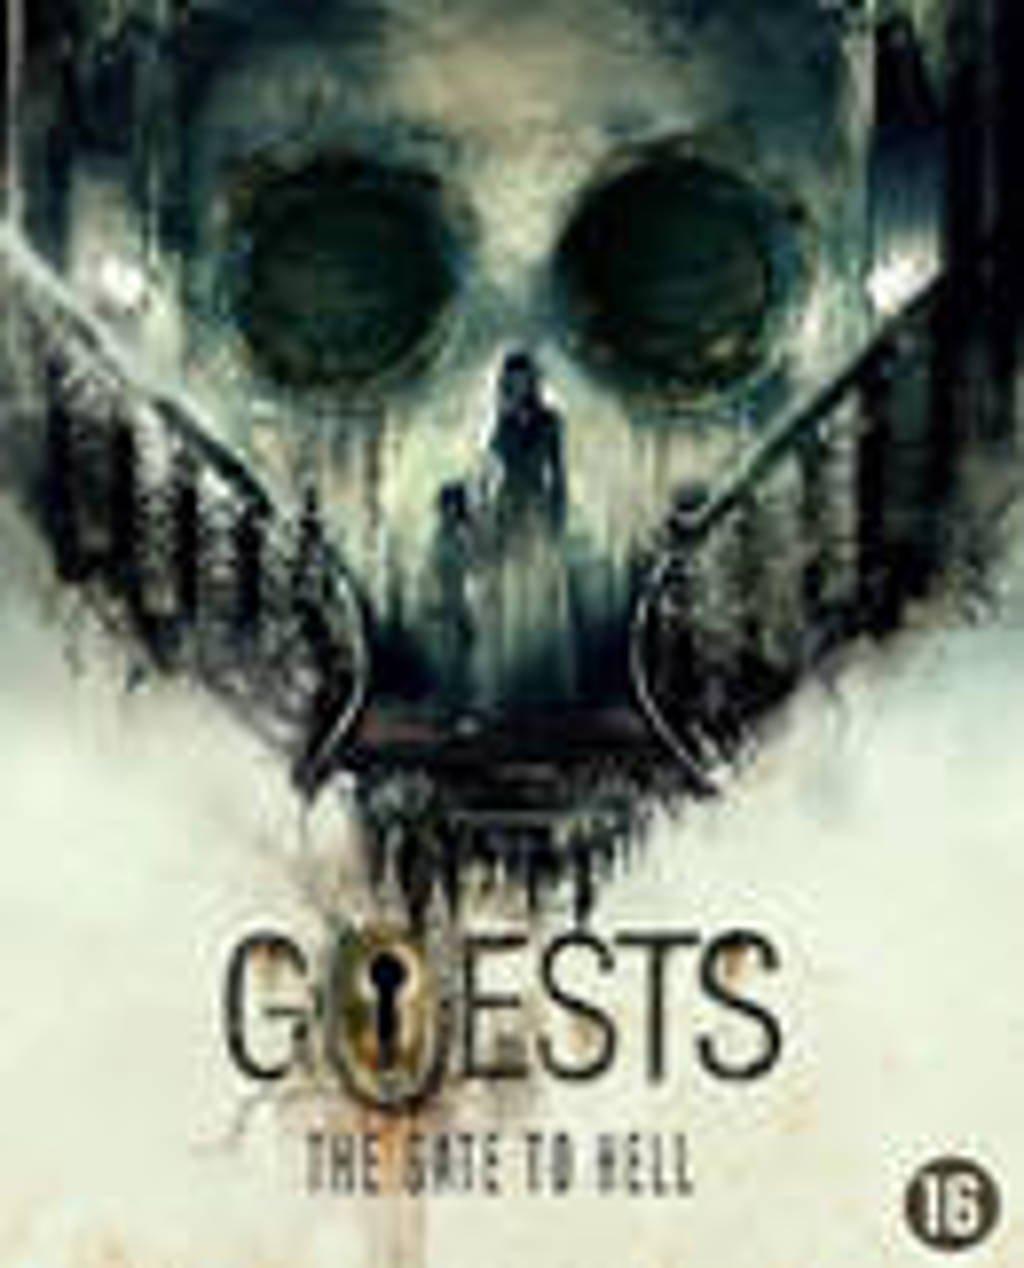 Guests (DVD)